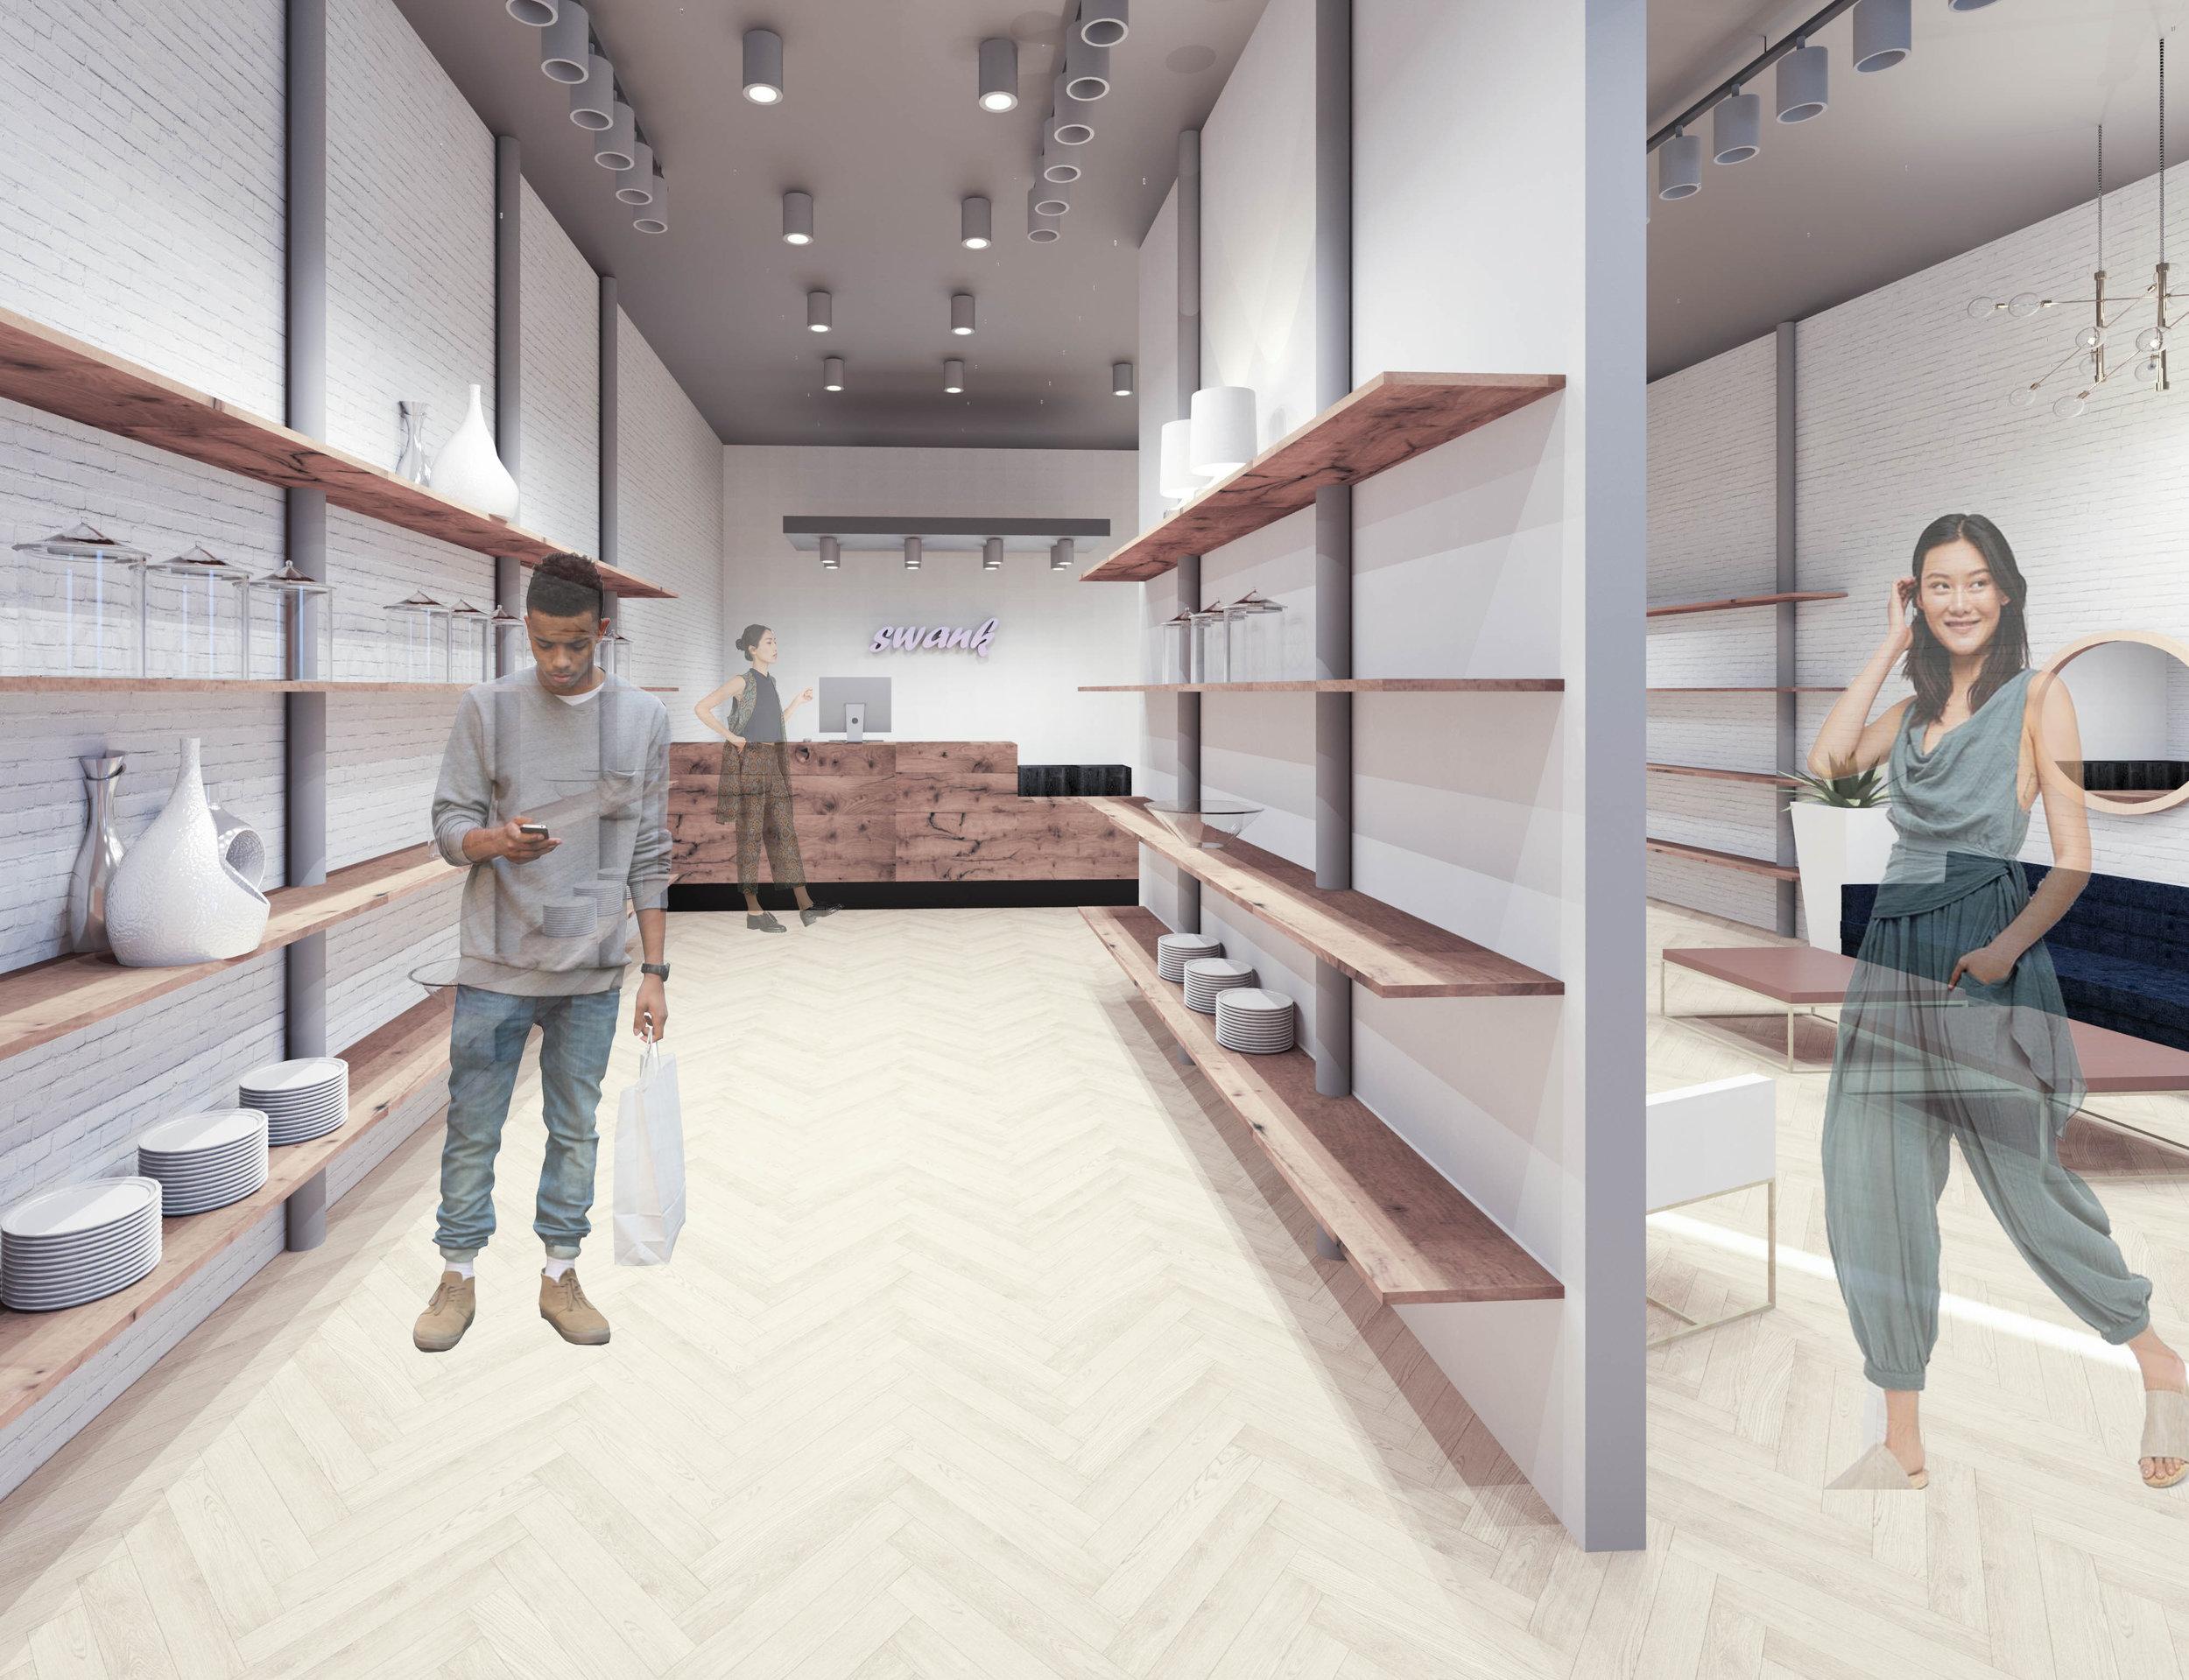 1st Floor: Entry/Shop